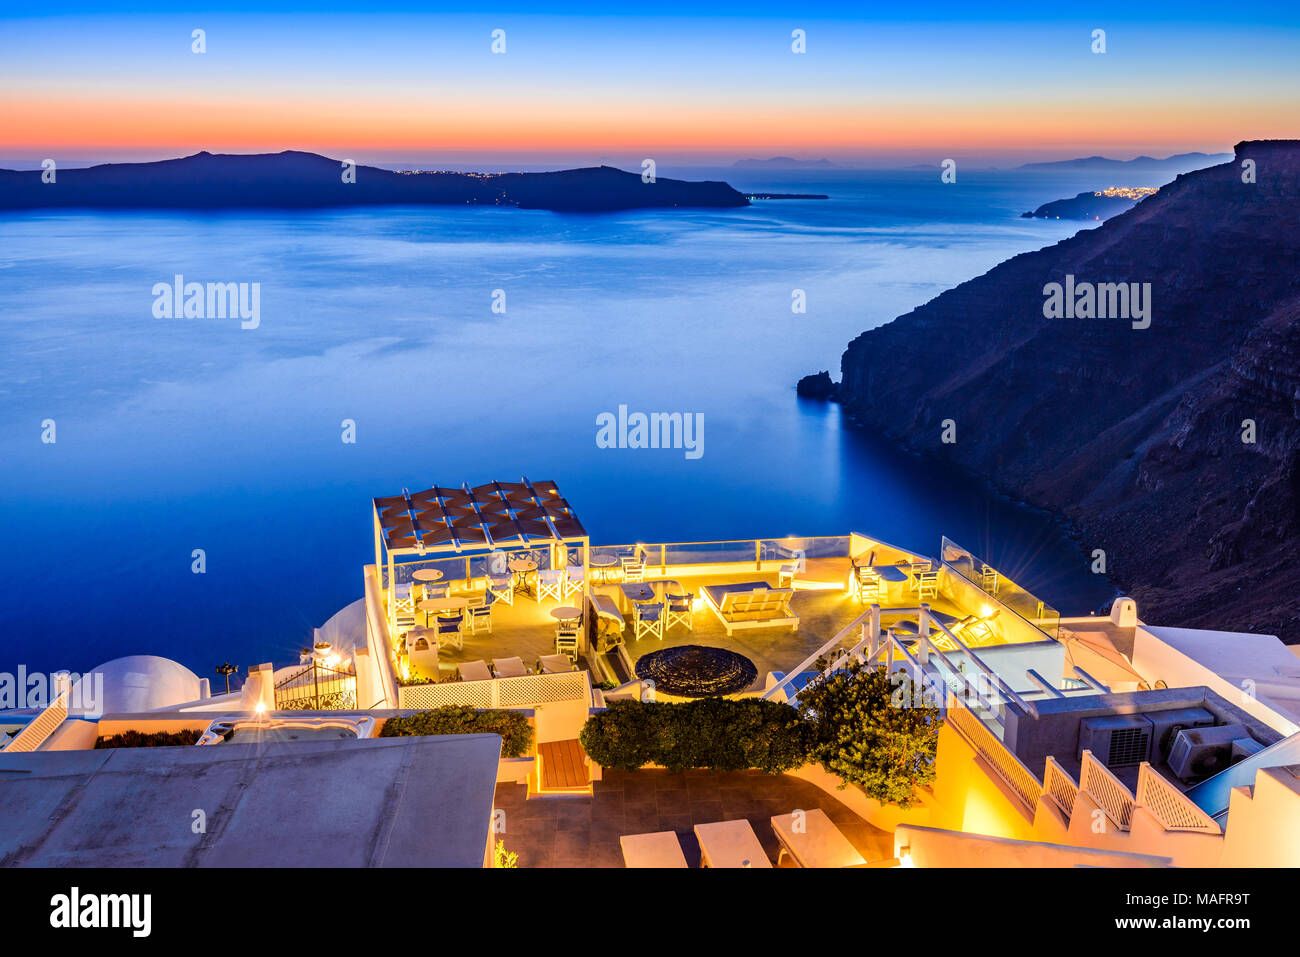 Santorini, Greece. Firostefani twilight, old village in Thira island, Cyclades and Mediterranean Sea. - Stock Image